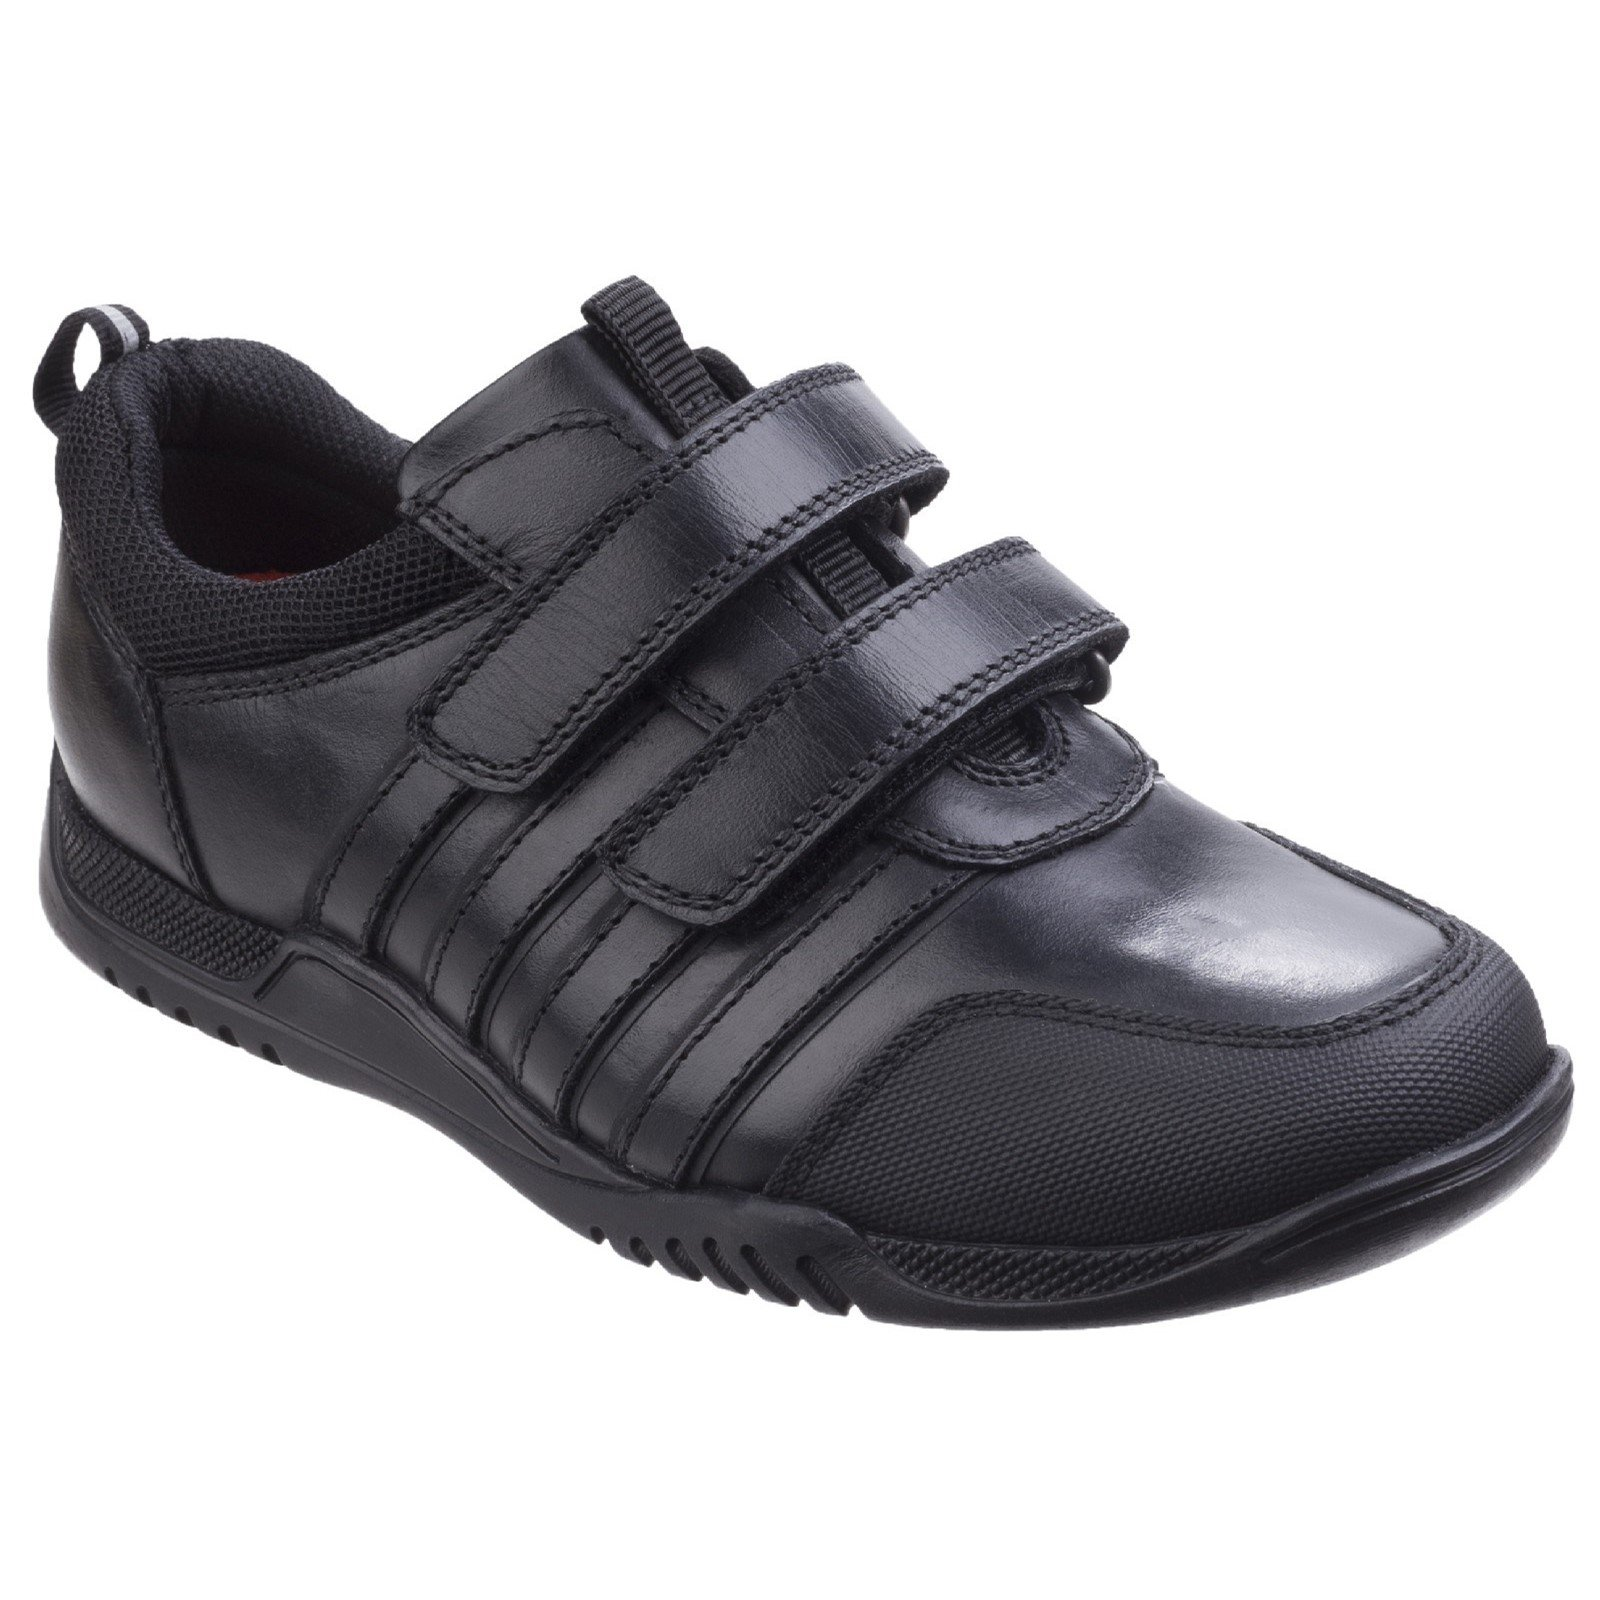 Hush Puppies Kid's Josh Senior School Shoe Black 26396 - Black 4